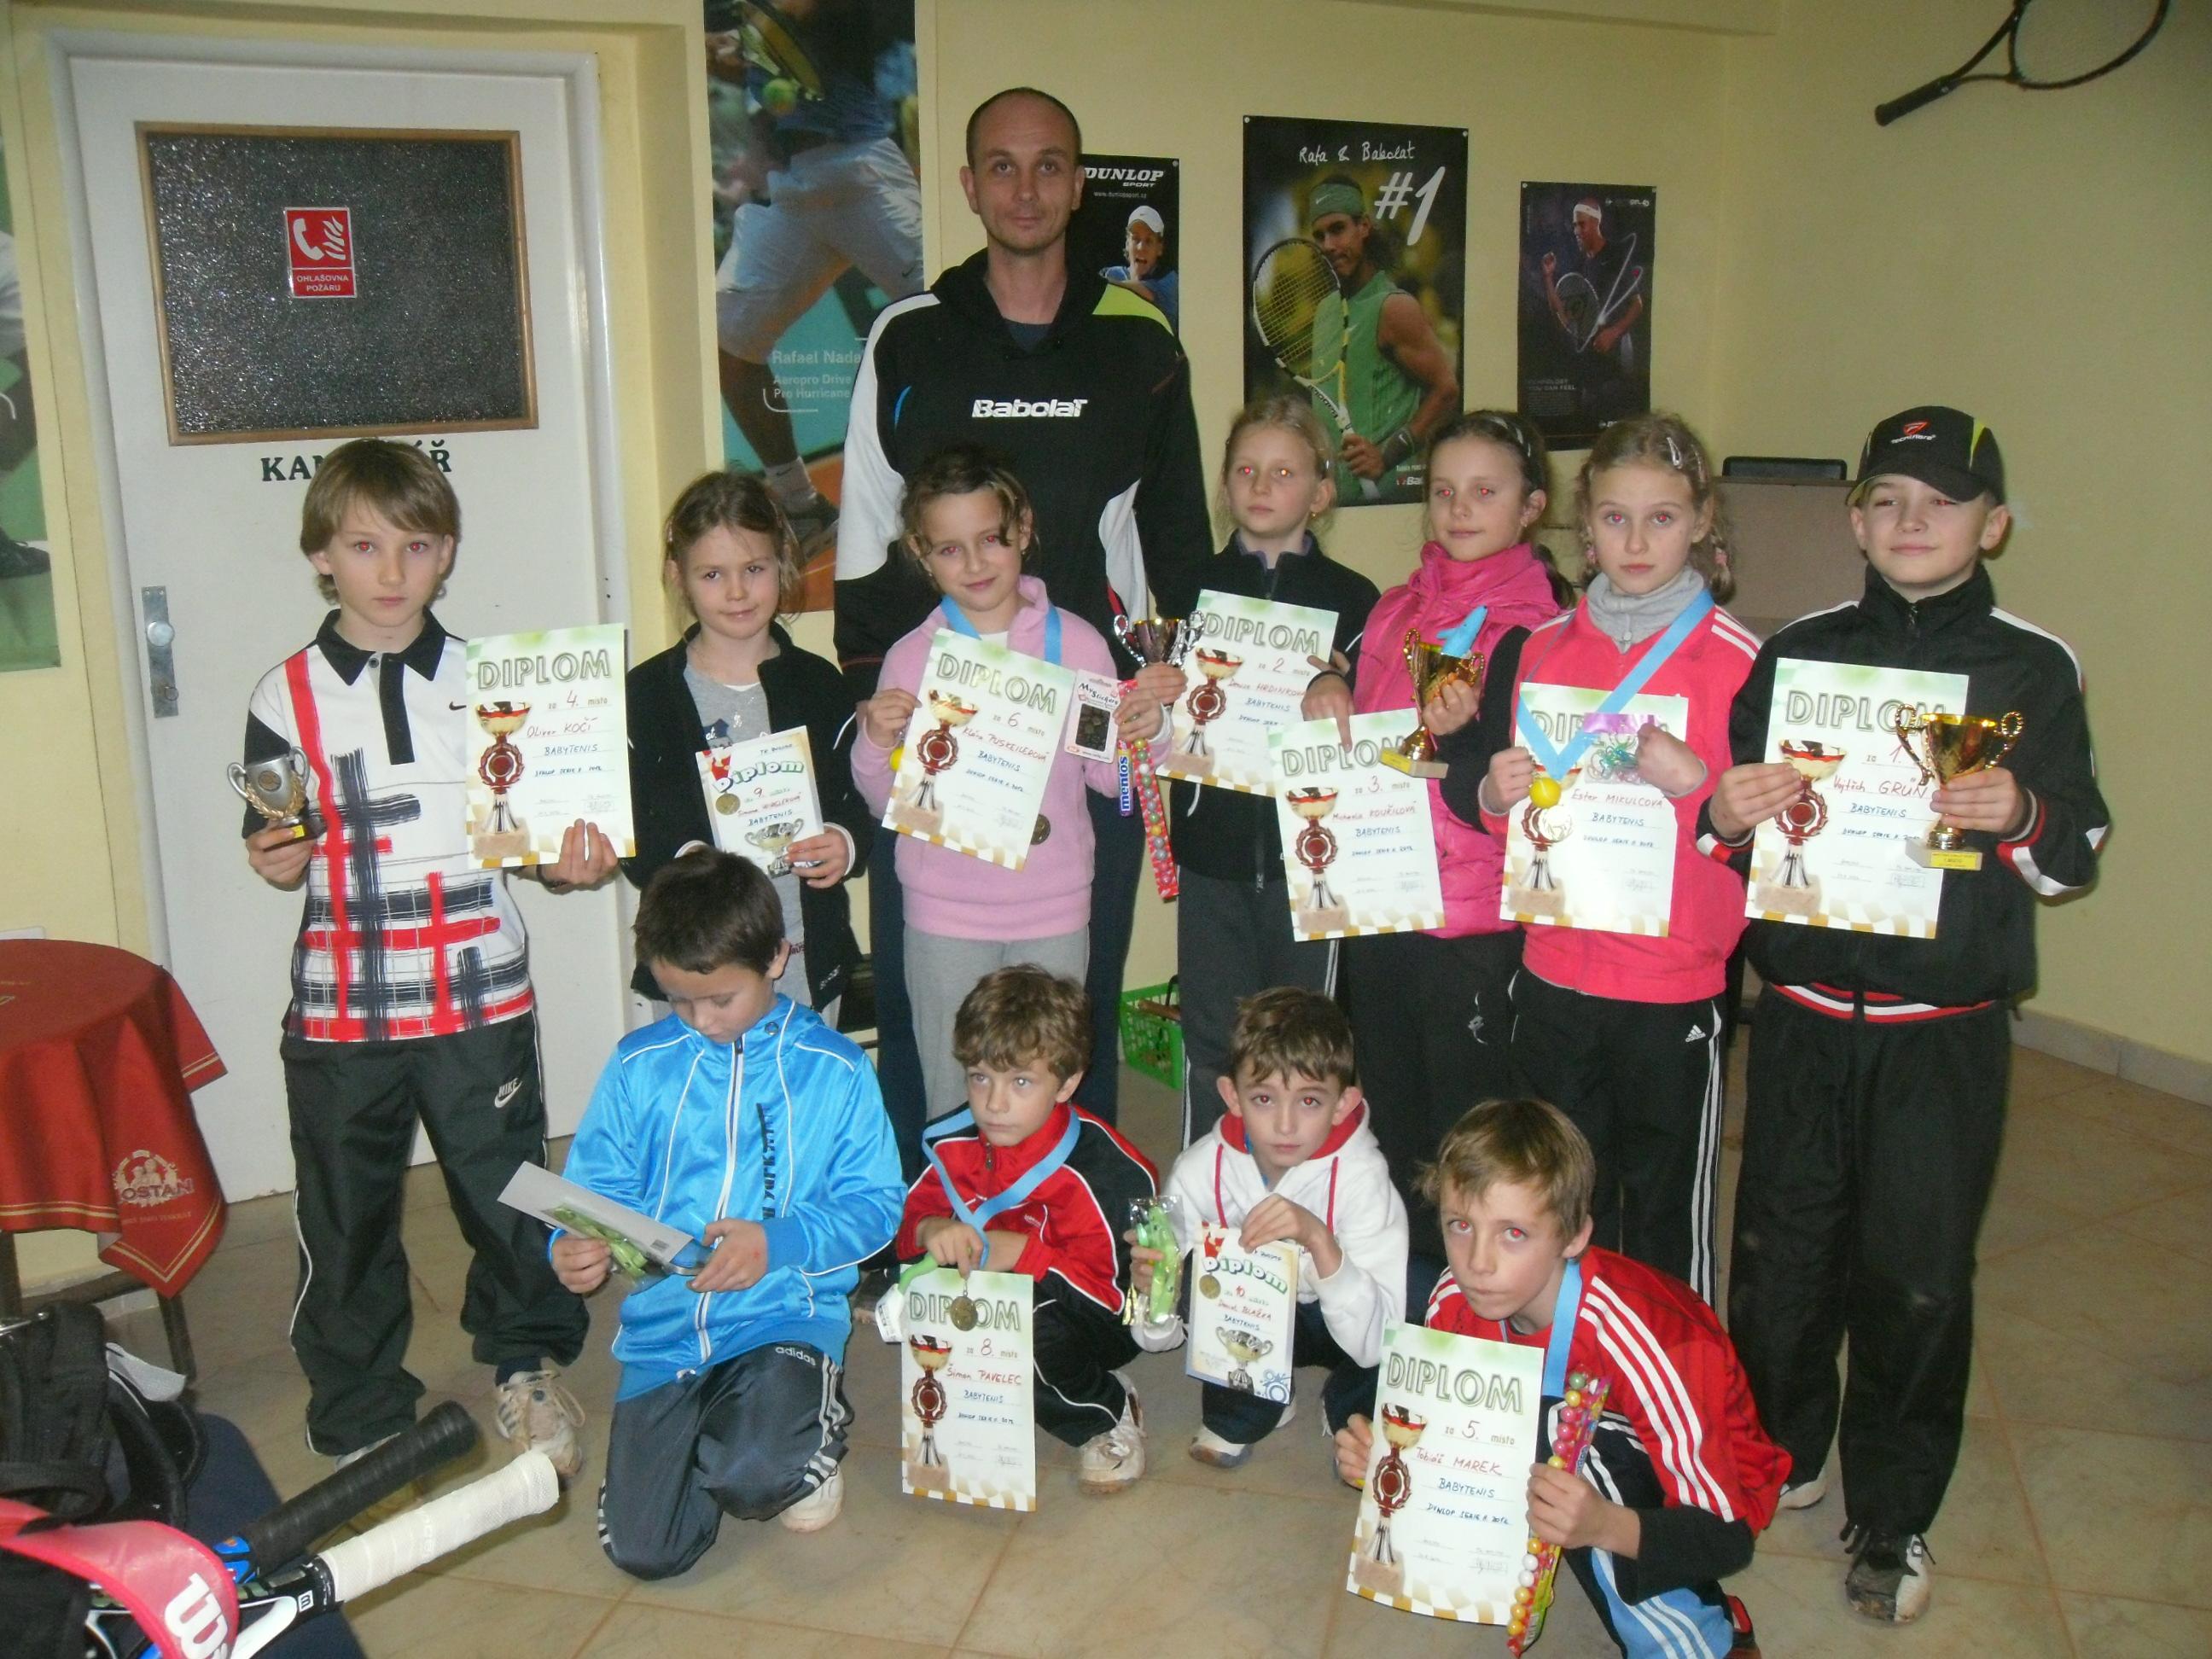 Babytenis. turnaj Dunlop Serie II. 21.1.2012